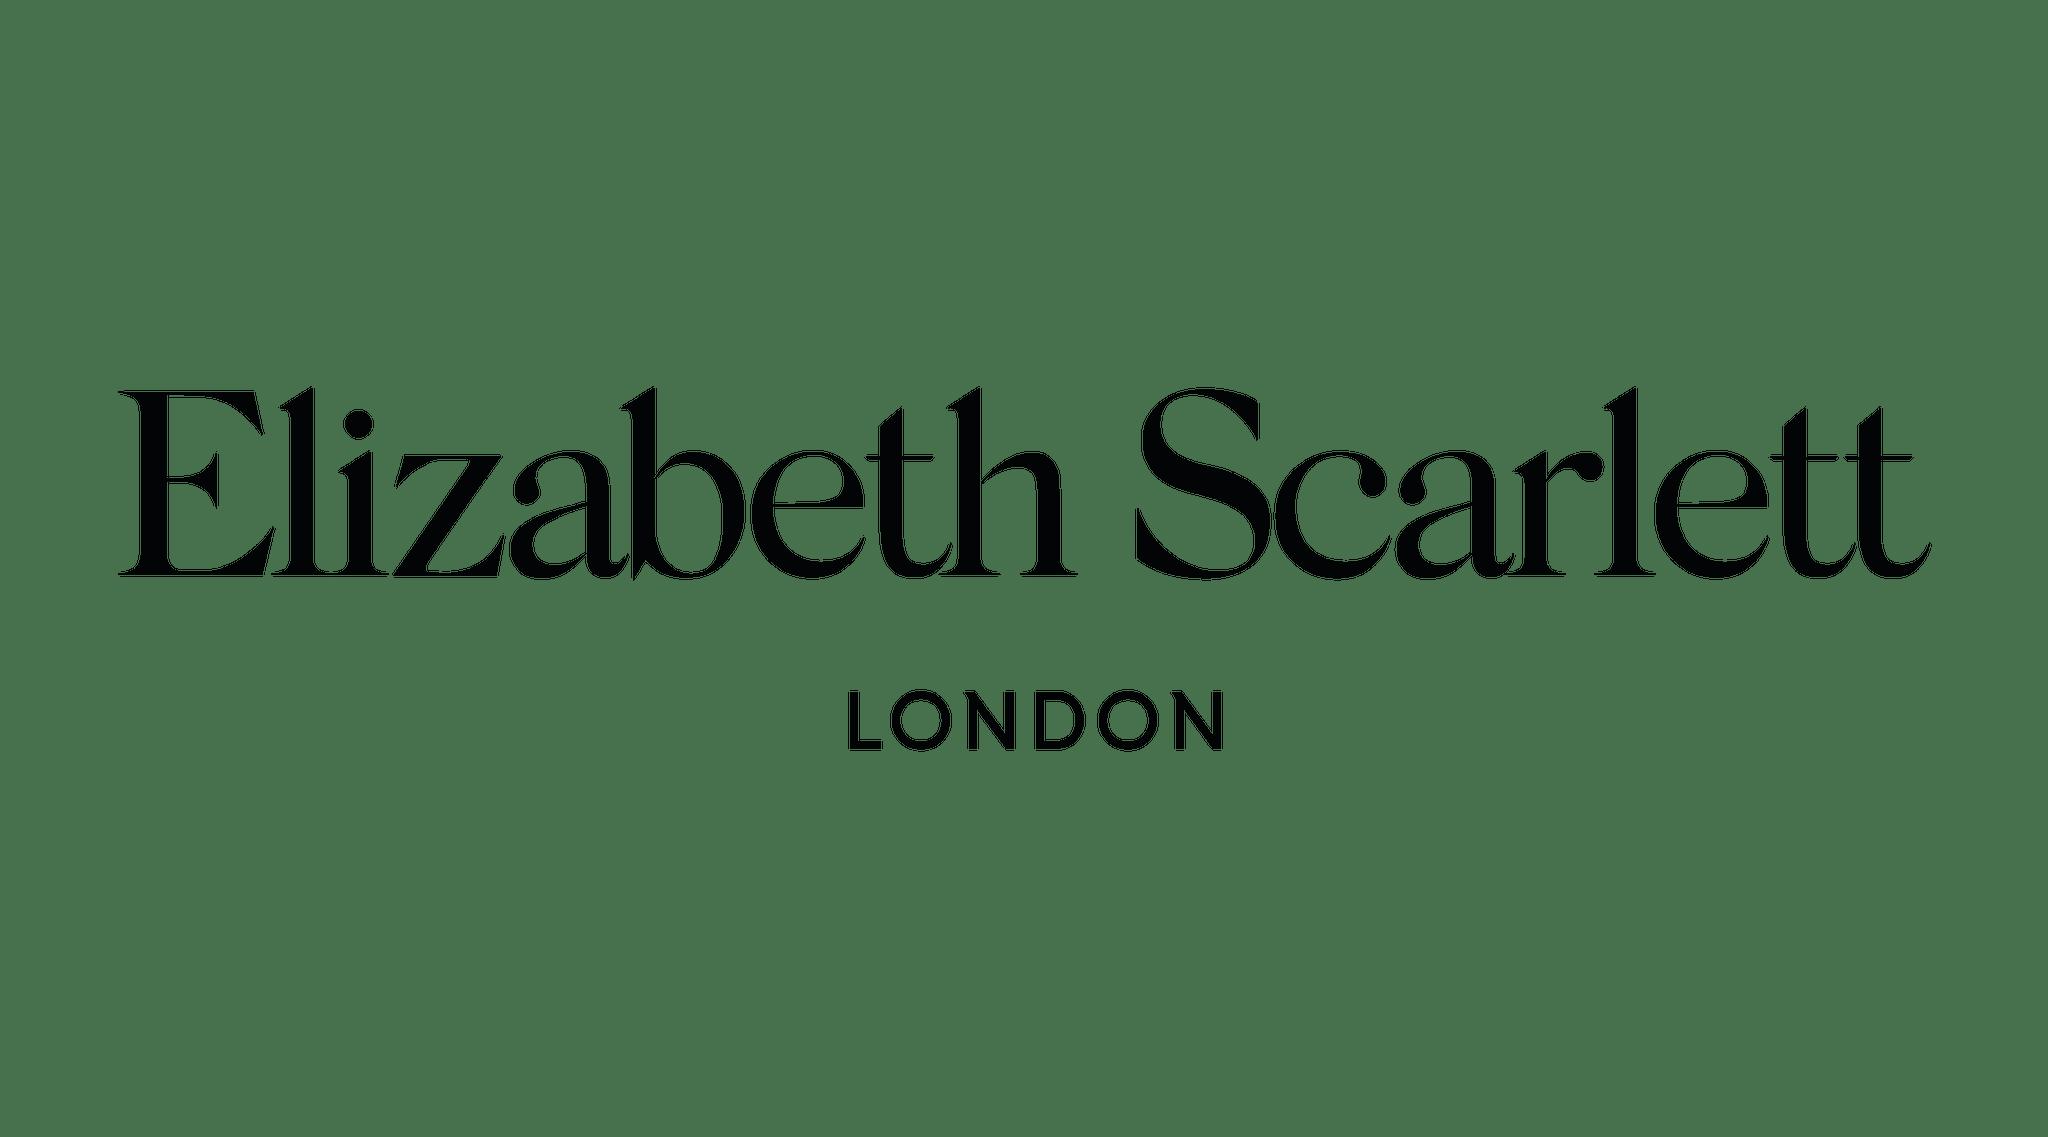 ELIZABETH SCARLETT